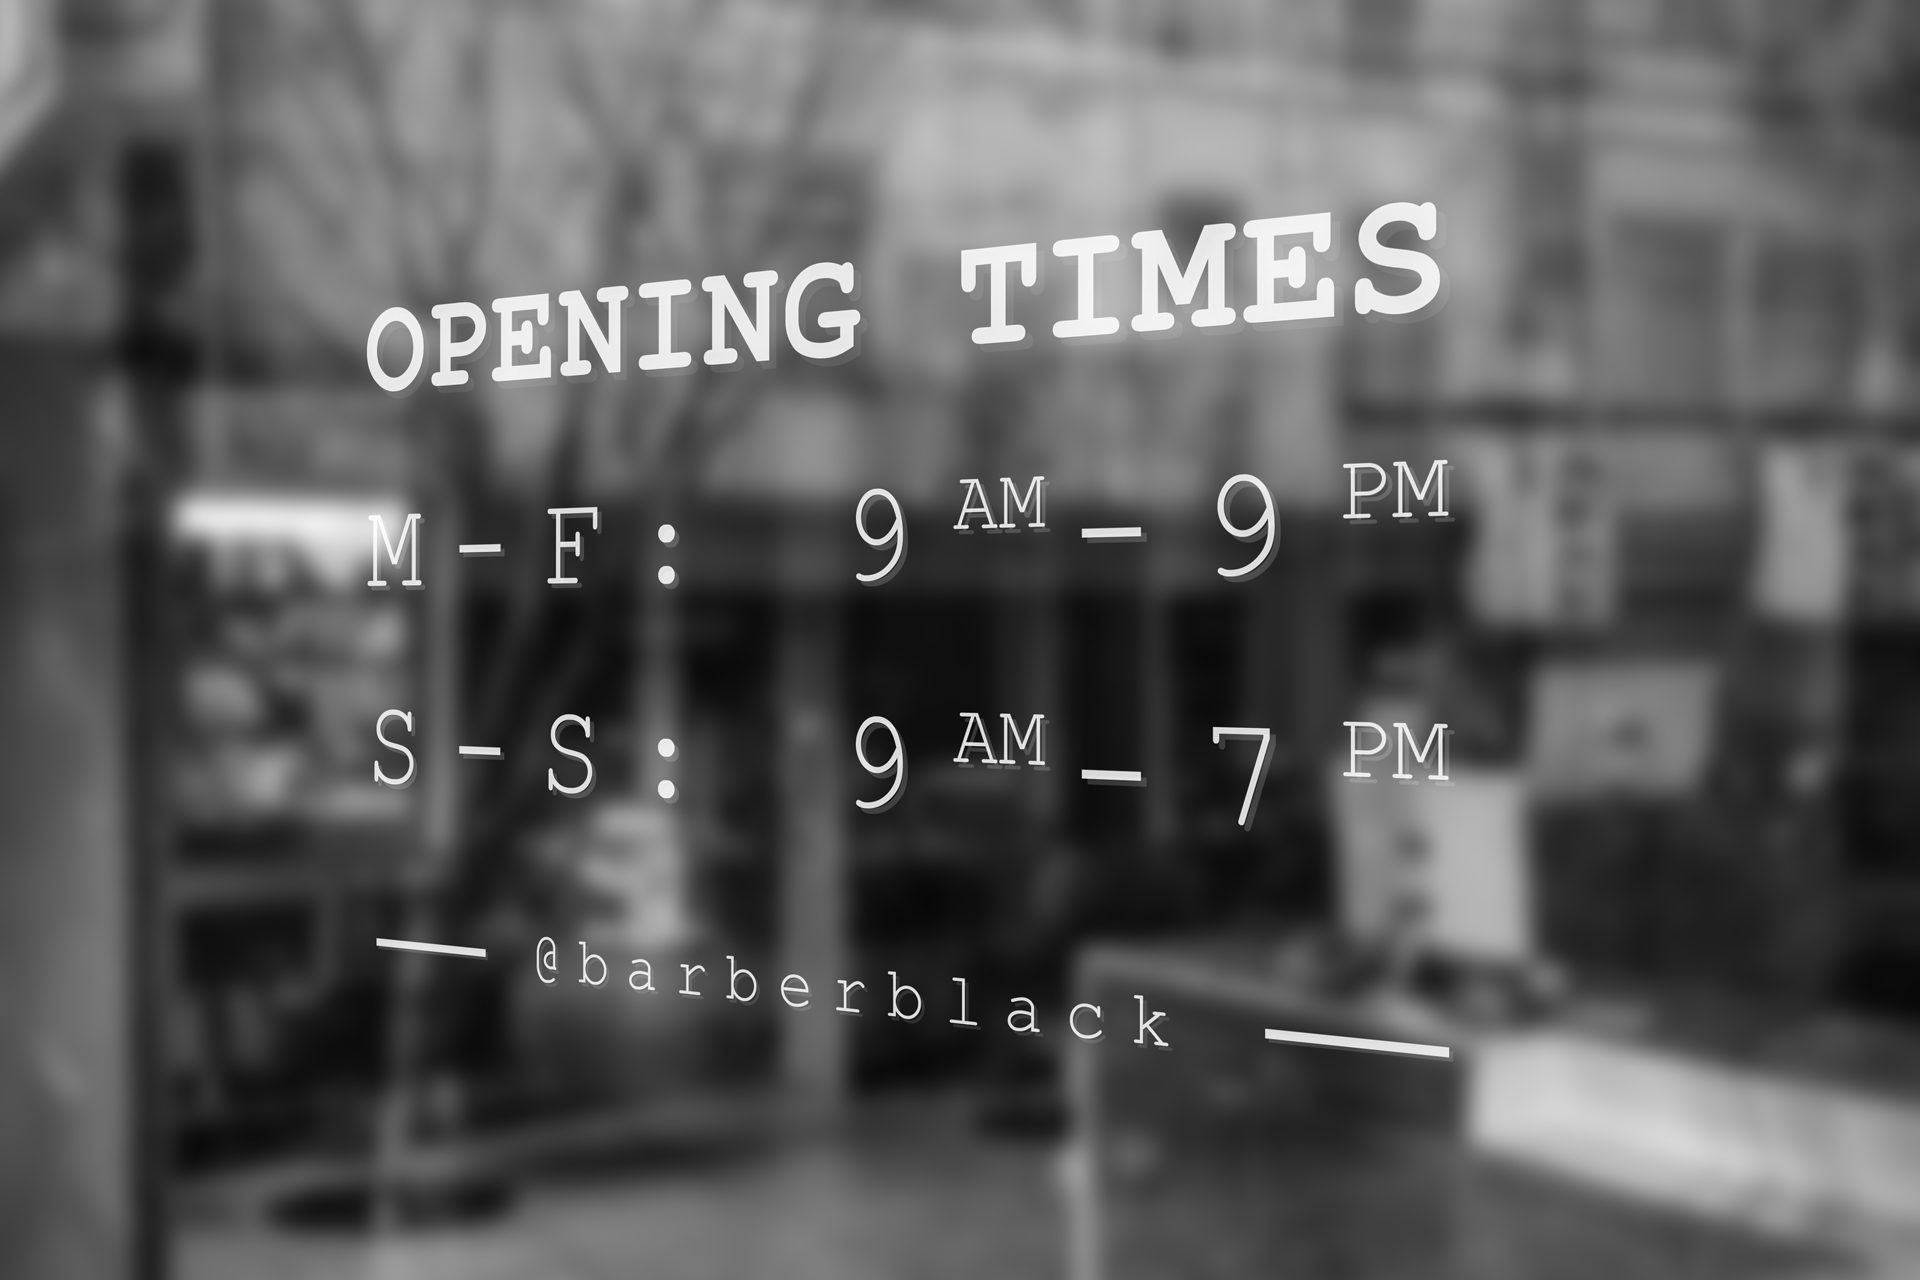 barber-black-opening-times.jpg